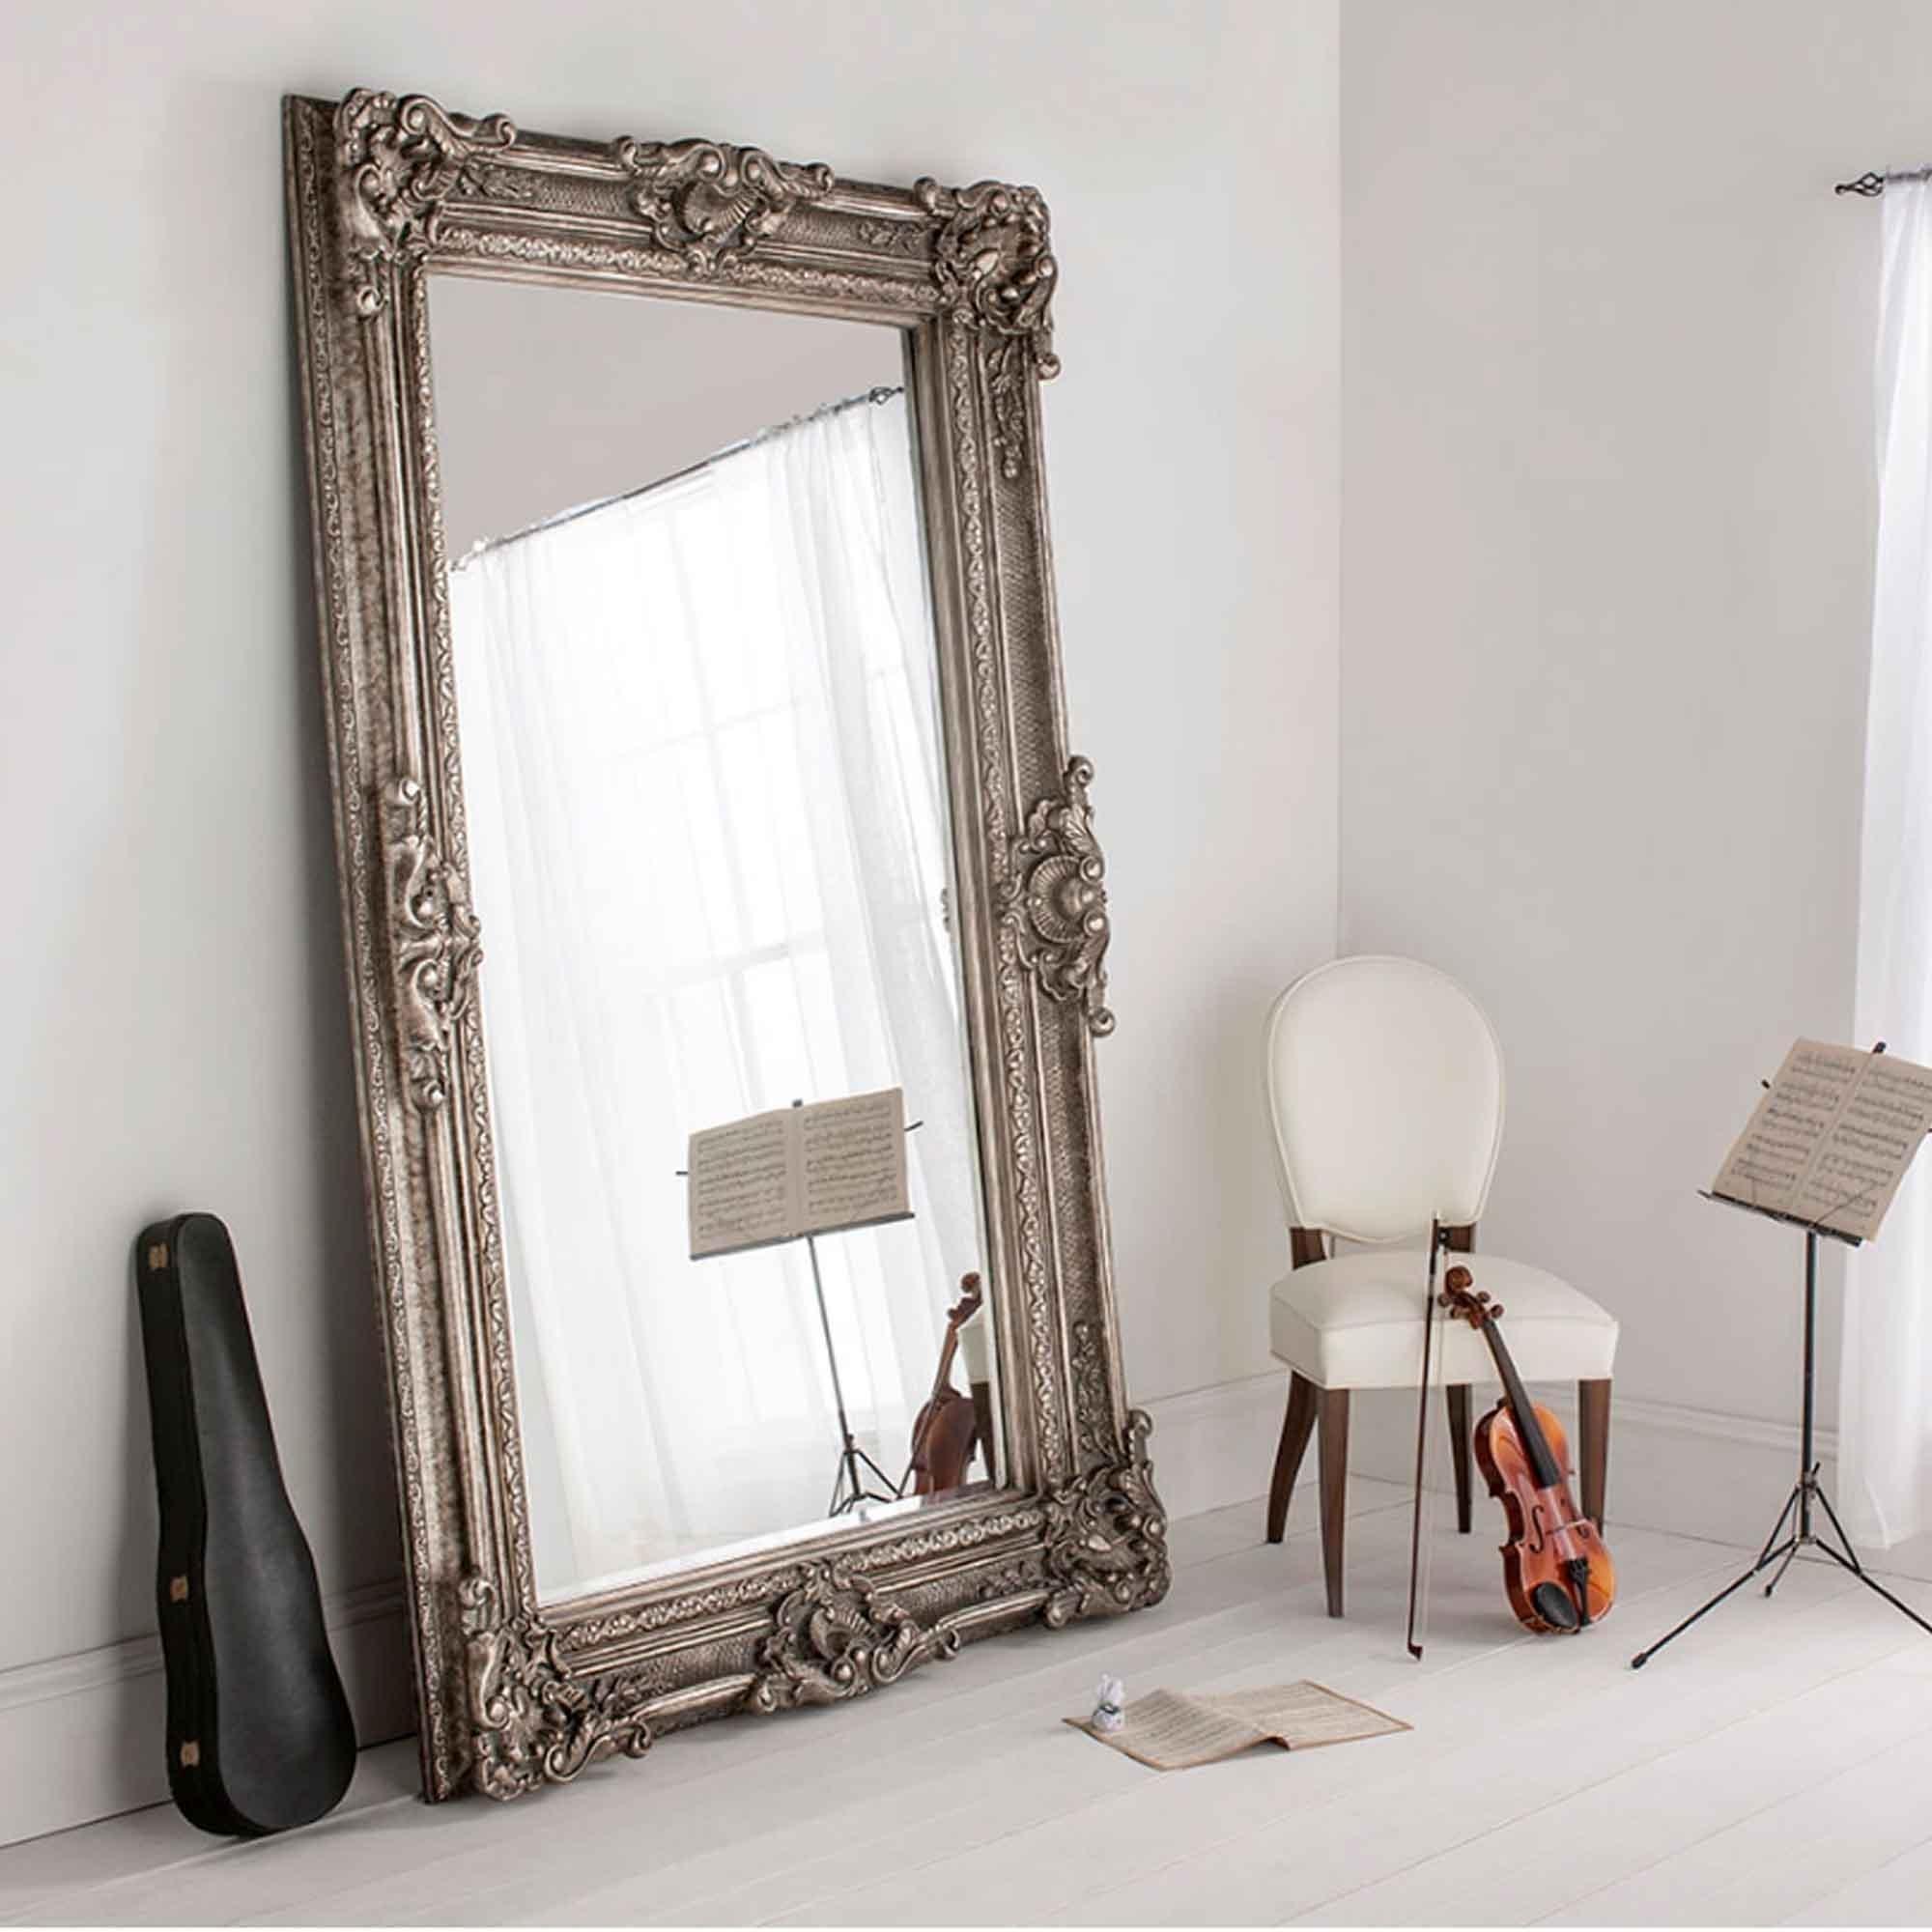 Extra Large Floor Standing Mirror Uk | Floor Decoration With Regard To French Floor Mirror (Image 9 of 20)